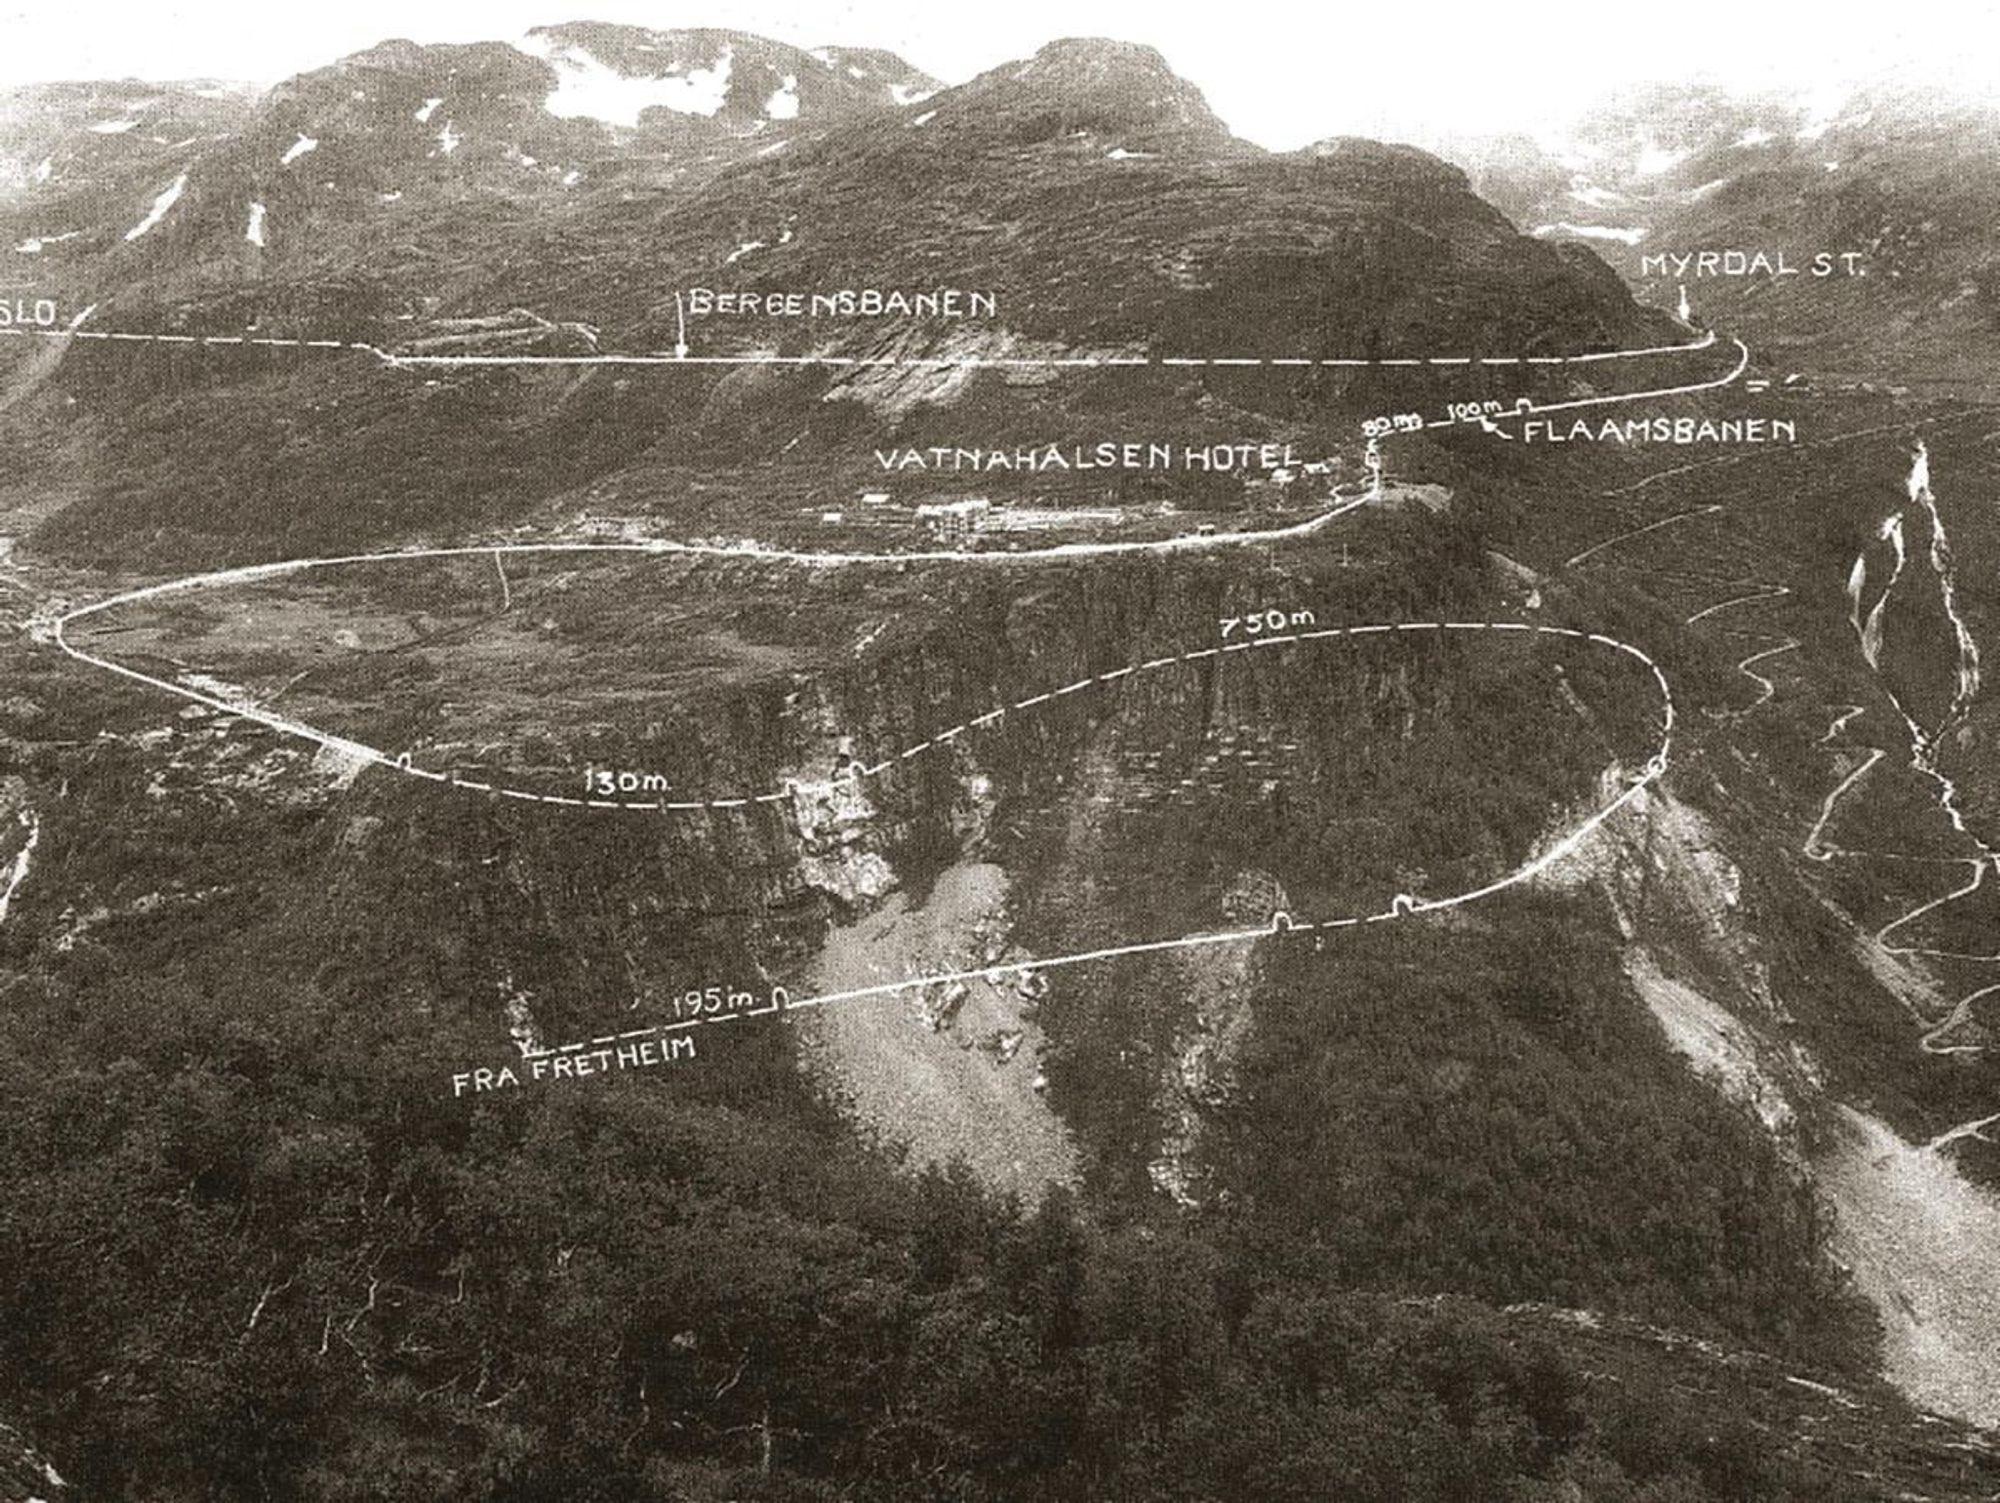 flåmsbanen kart FORSKNING: Nordmannen som bygget verdens veier   Tu.no flåmsbanen kart